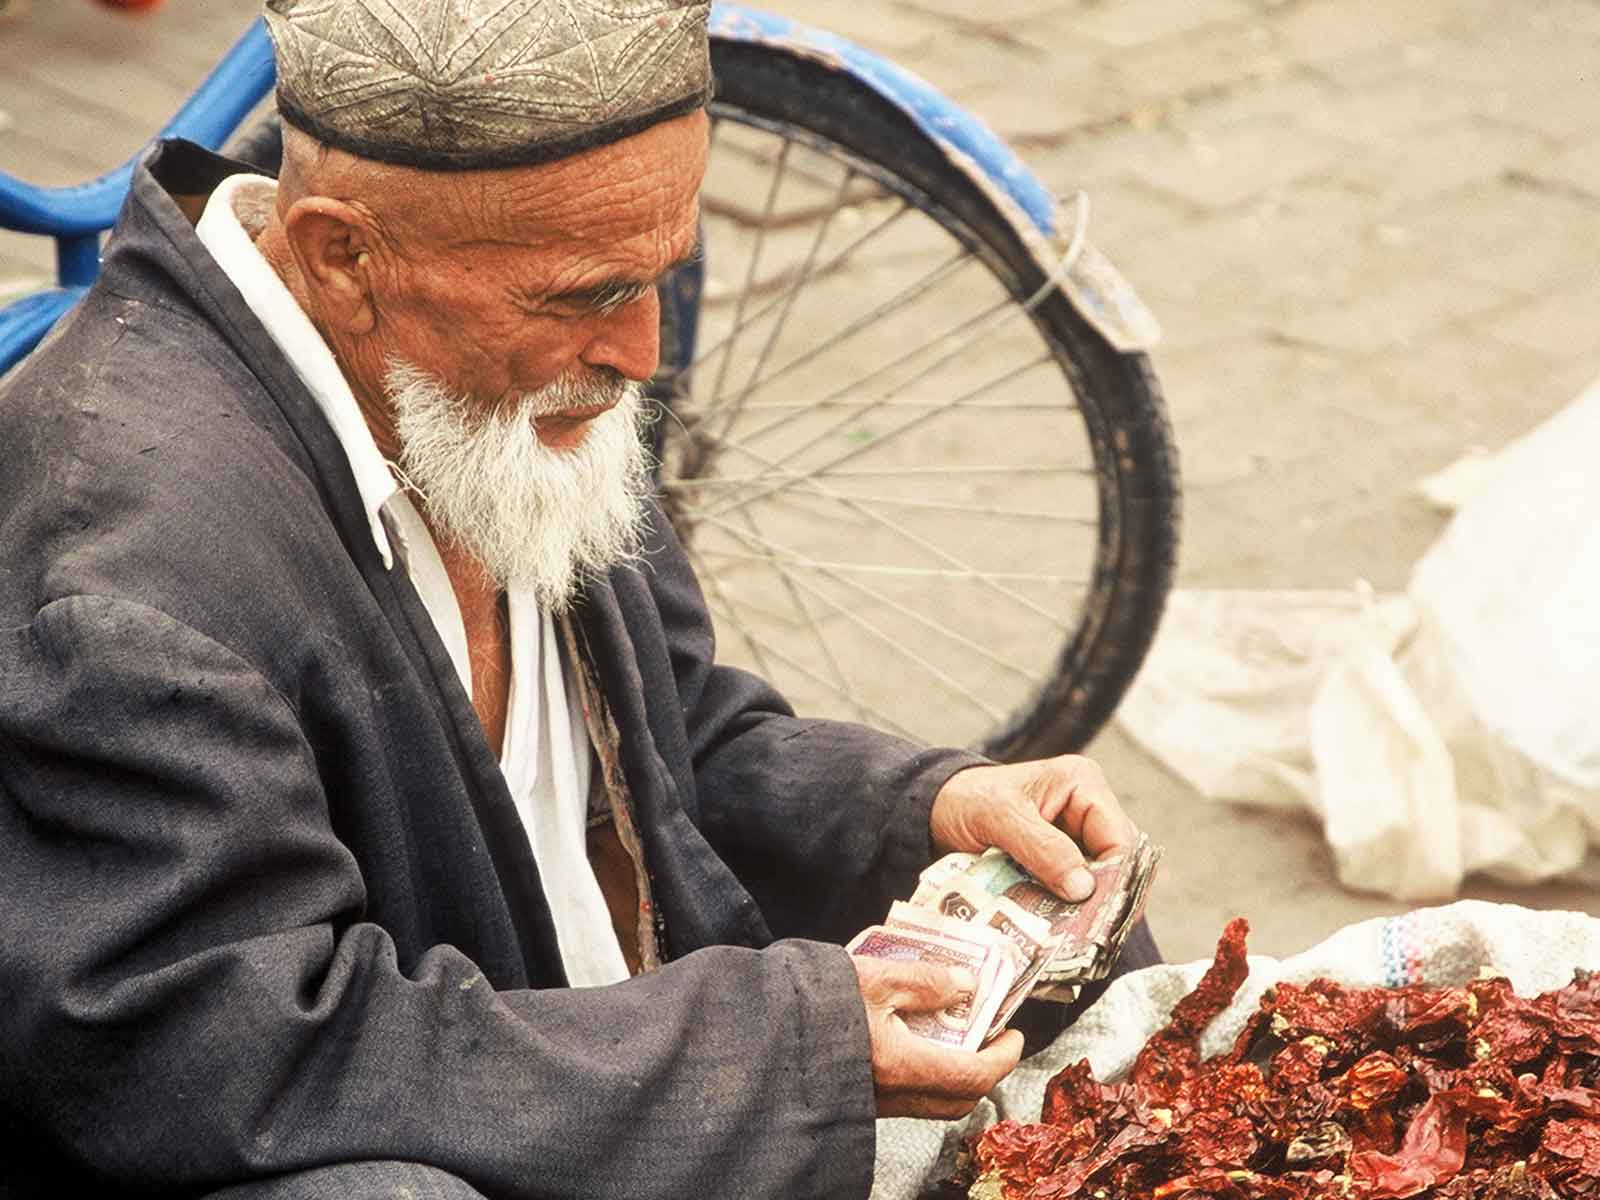 Chili Peppers - Kashgar Bazaar - China Silk Road Photo Journal - Dr Steven Andrew Martin